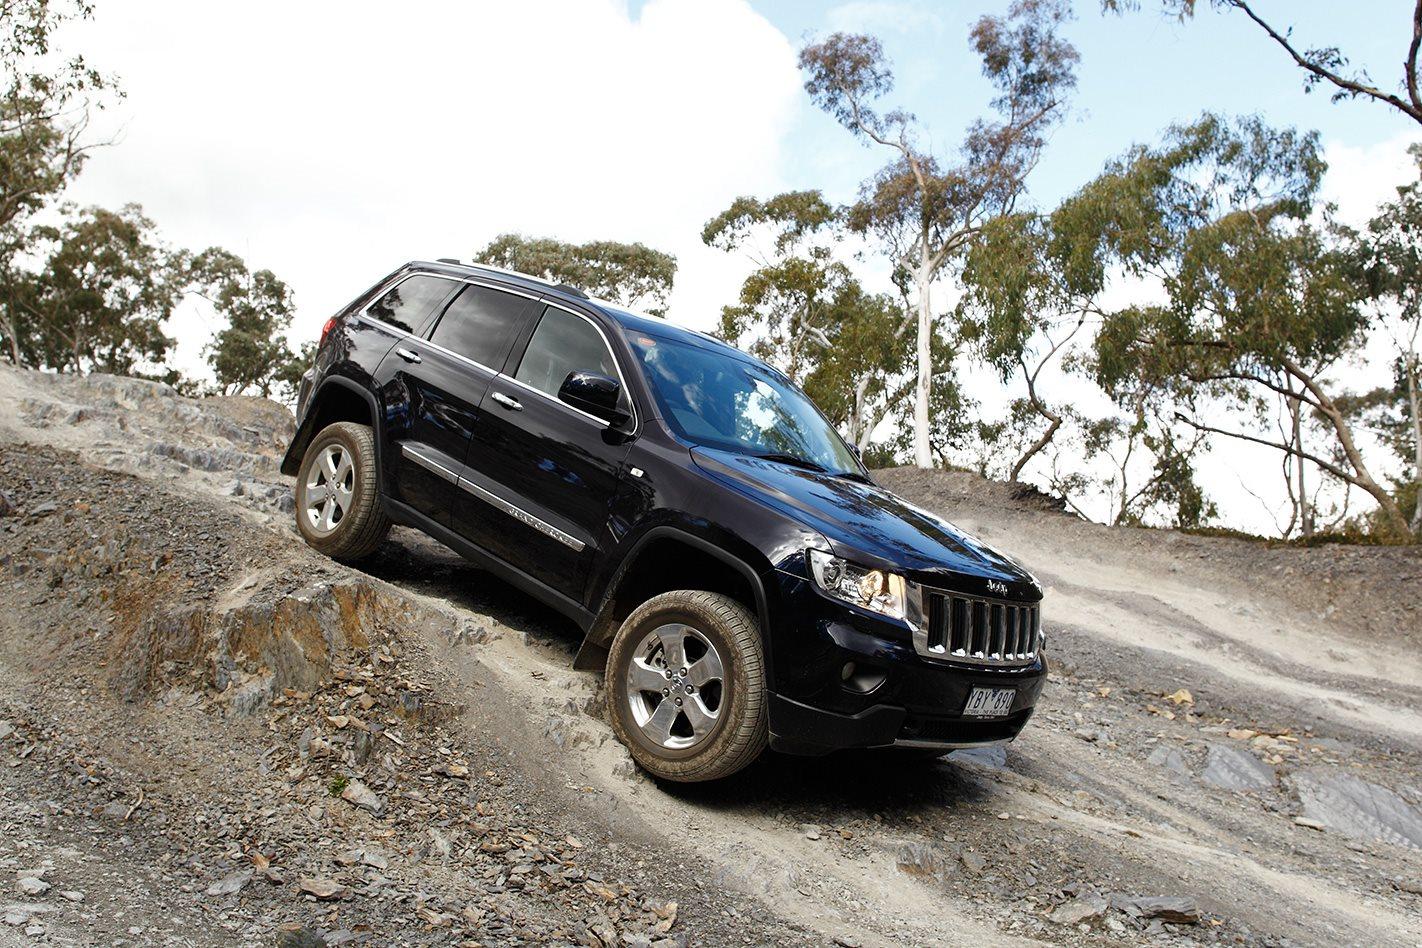 2011 Jeep Grand Cherokee downhill.jpg